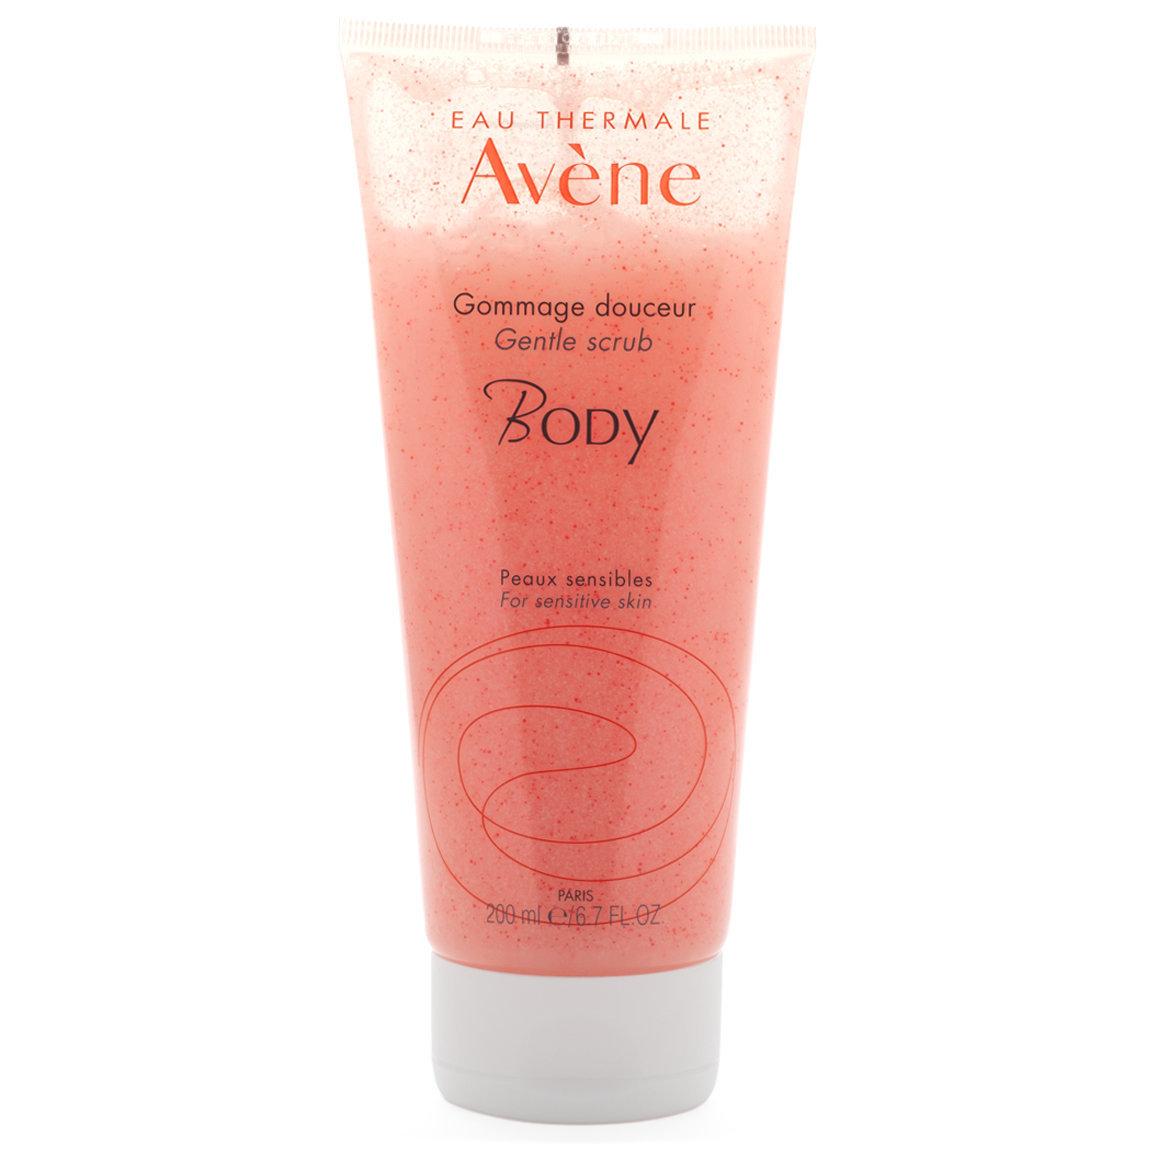 Eau Thermale Avène Gentle Scrub product swatch.